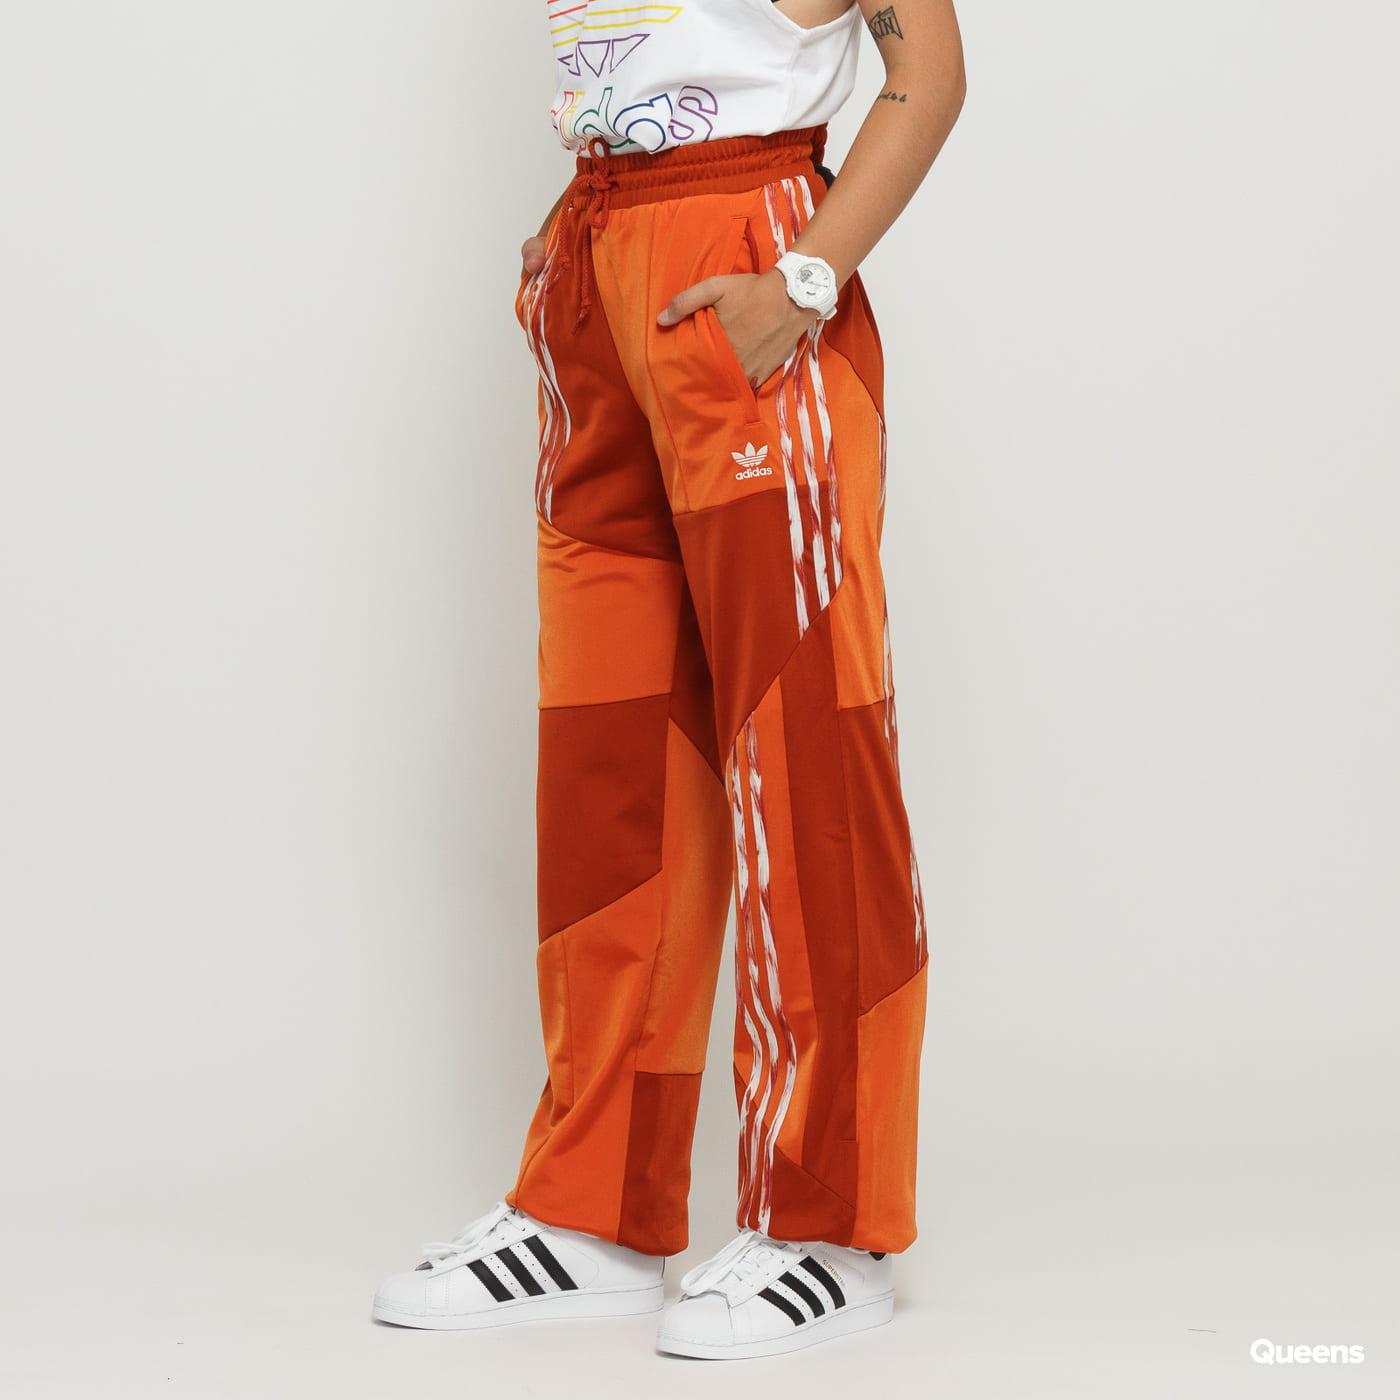 adidas Originals Danielle Cathari Firebird Track Pant oranzové tmave oranzové